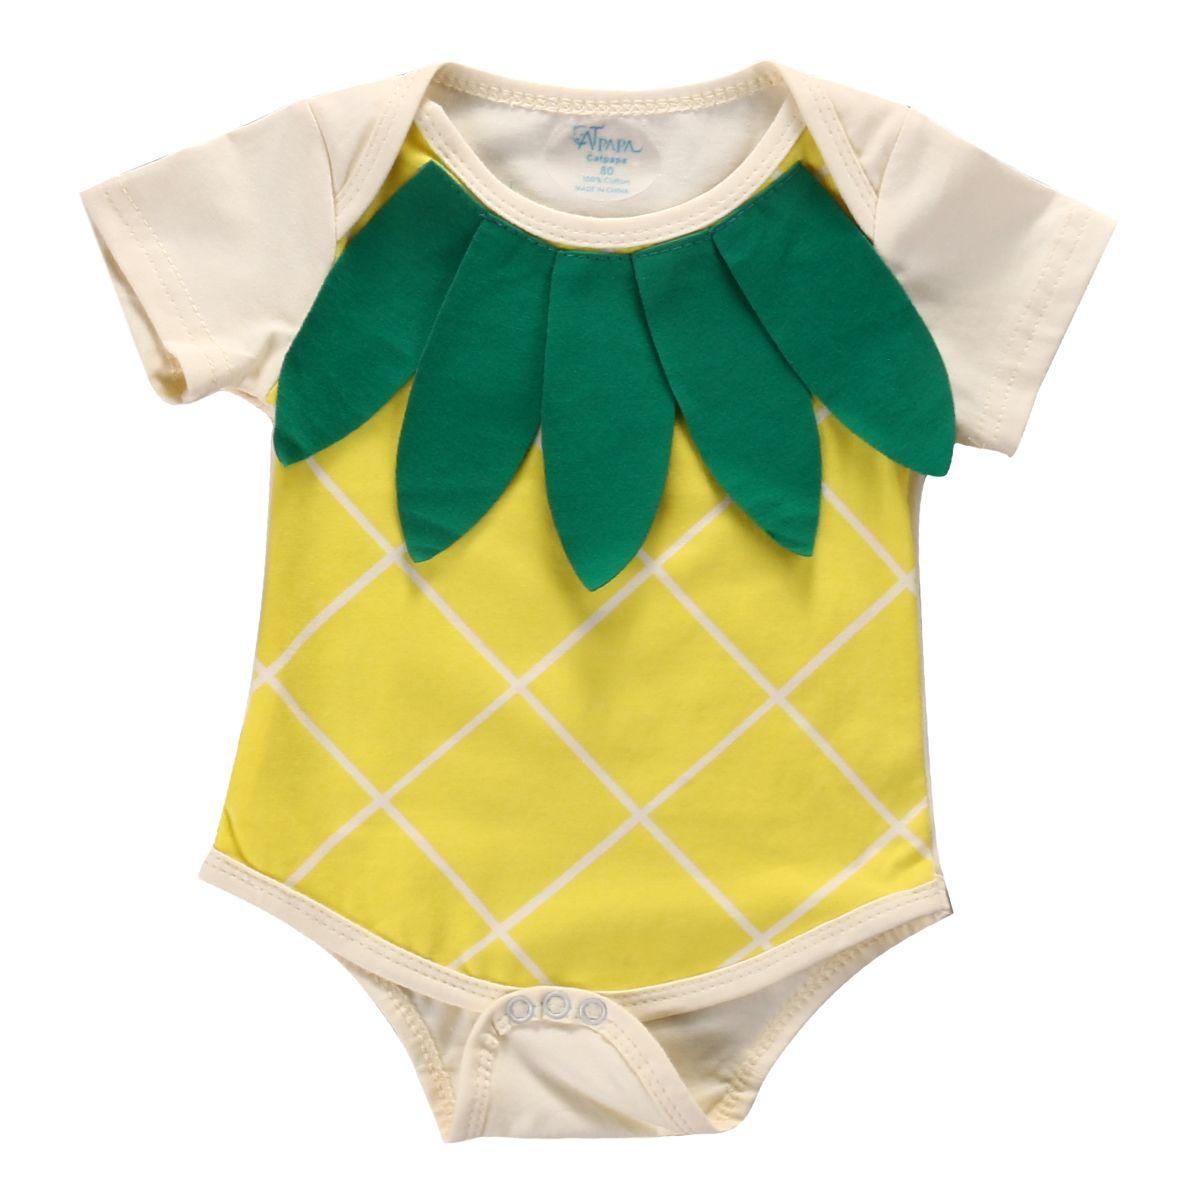 Baby Onesies Be a Pineapple Best 100/% Cotton Bodysuits Stylish Short Sleeve Bodysuit